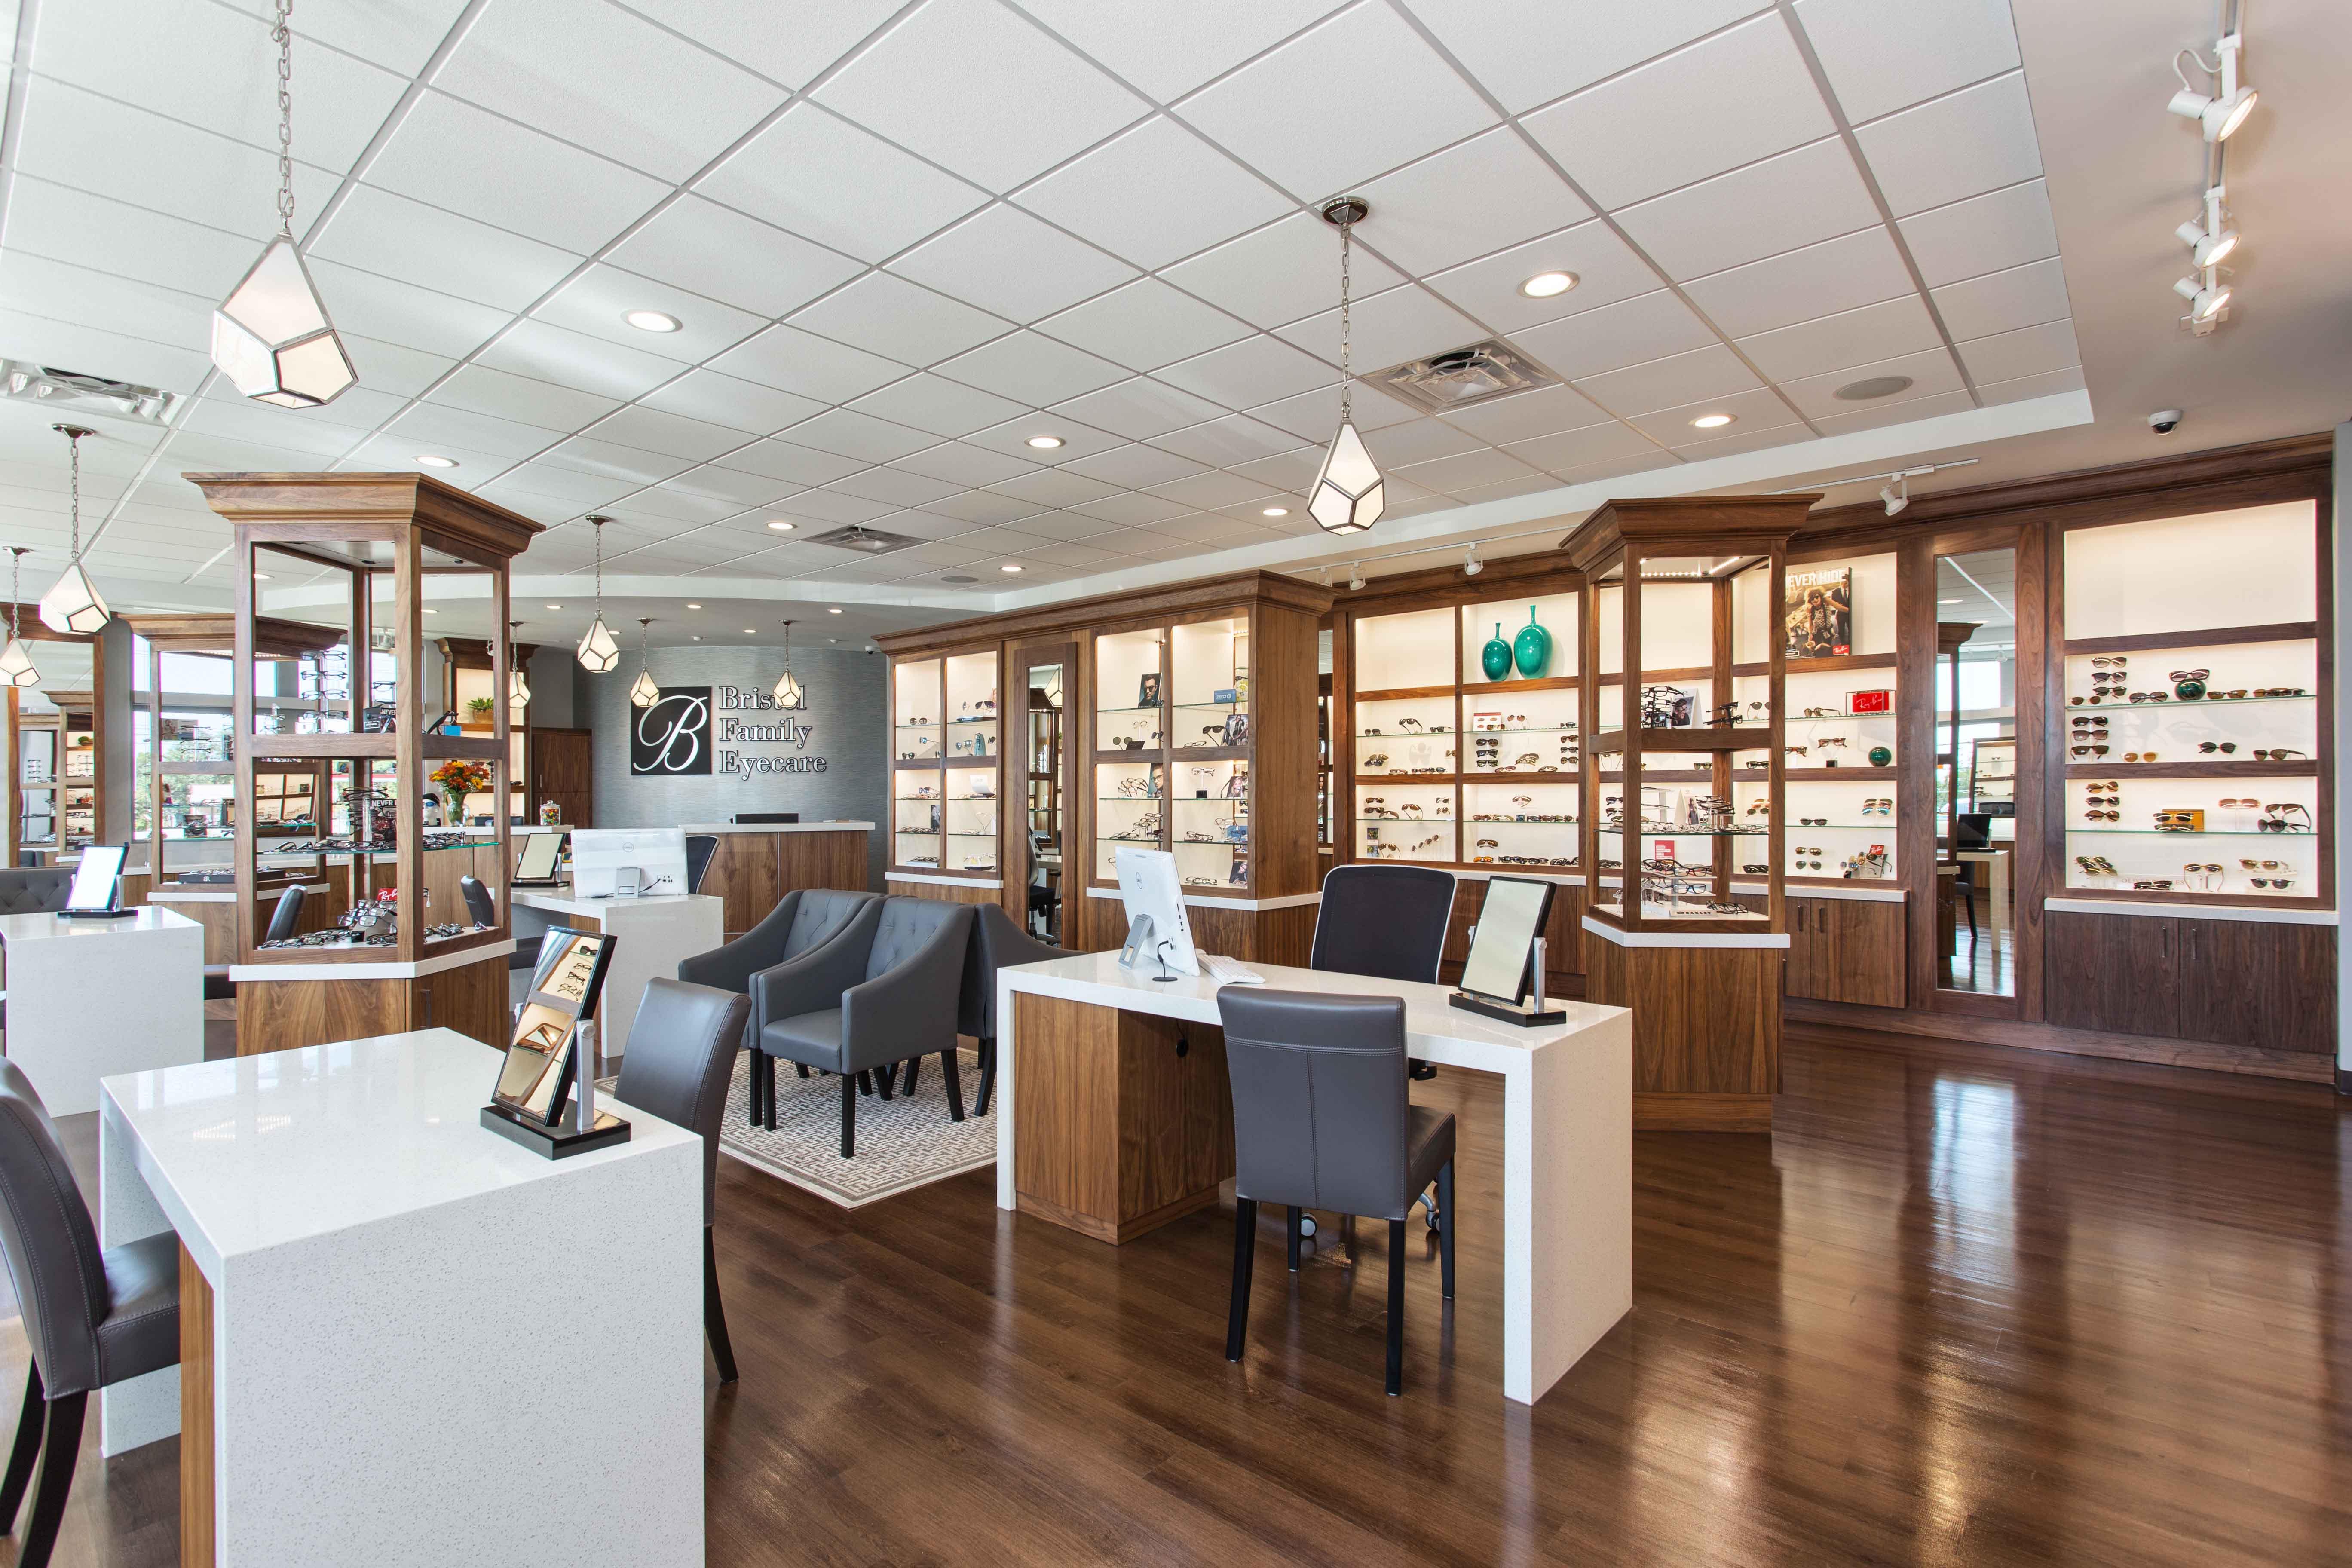 bristl-family-eyecare-consulting-area